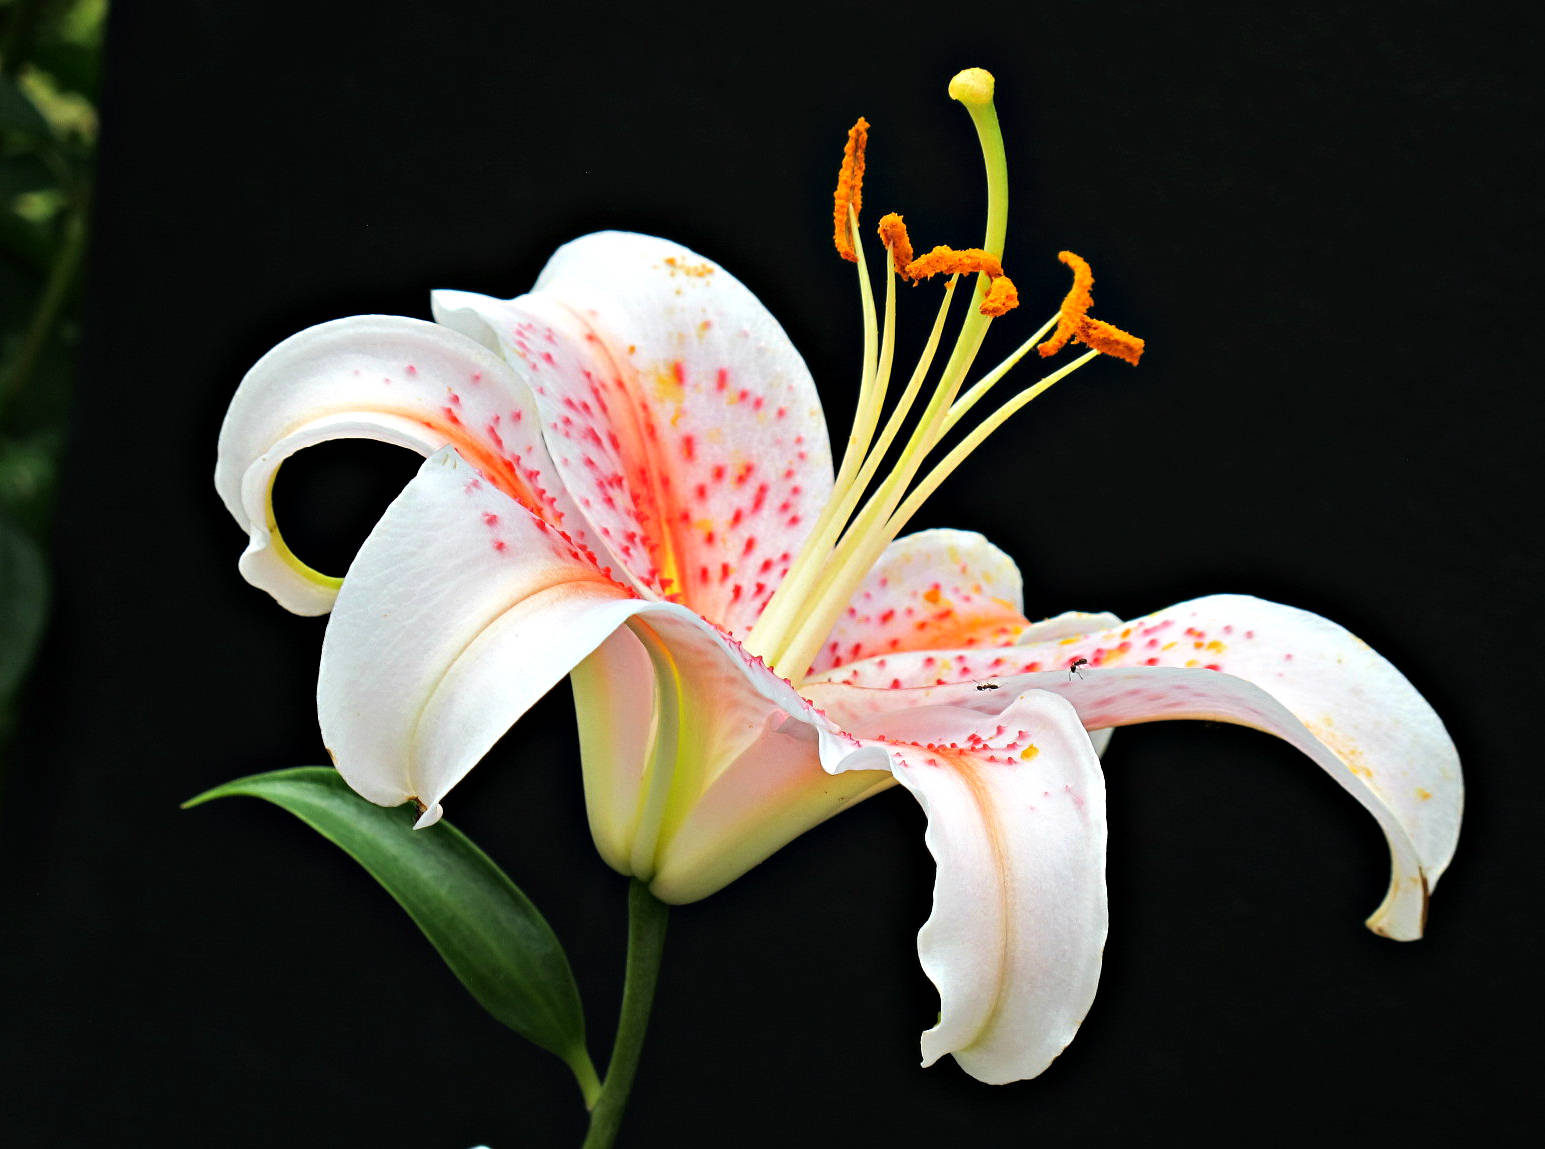 Kentlands photowalk lily img 4753 izmirmasajfo